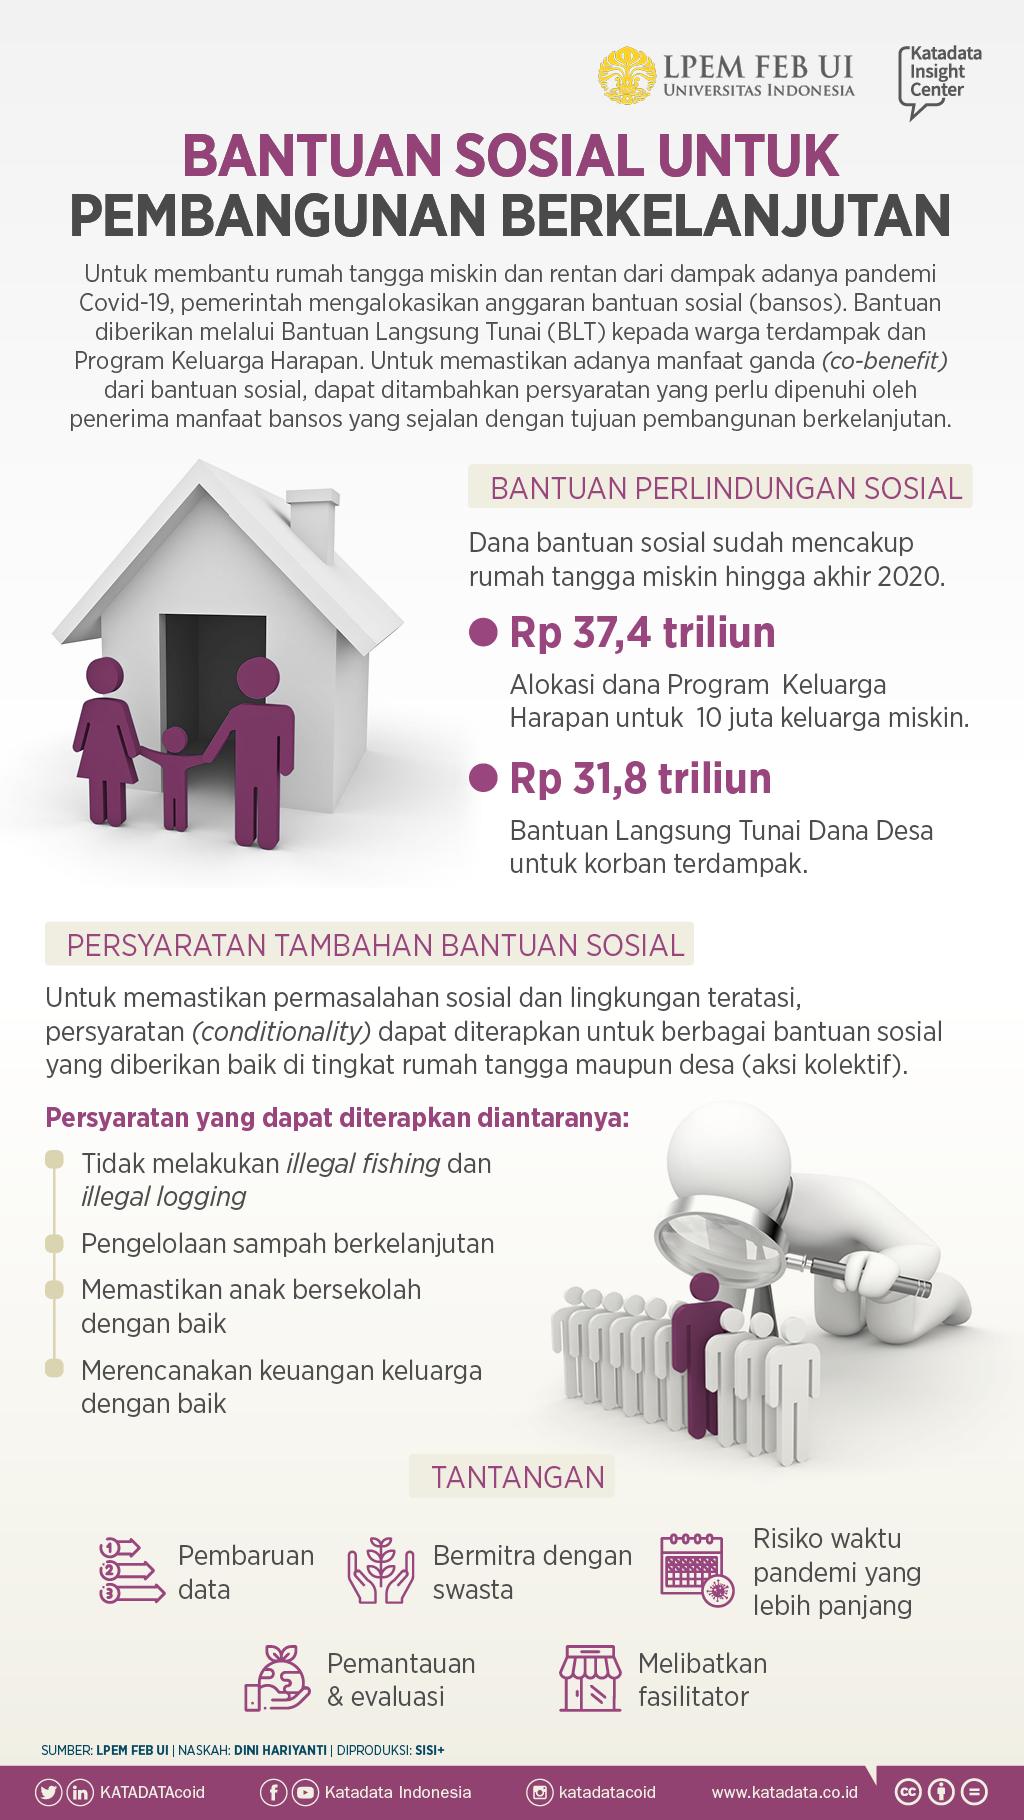 Bantuan Sosial untuk Pembangunan Berkelanjutan